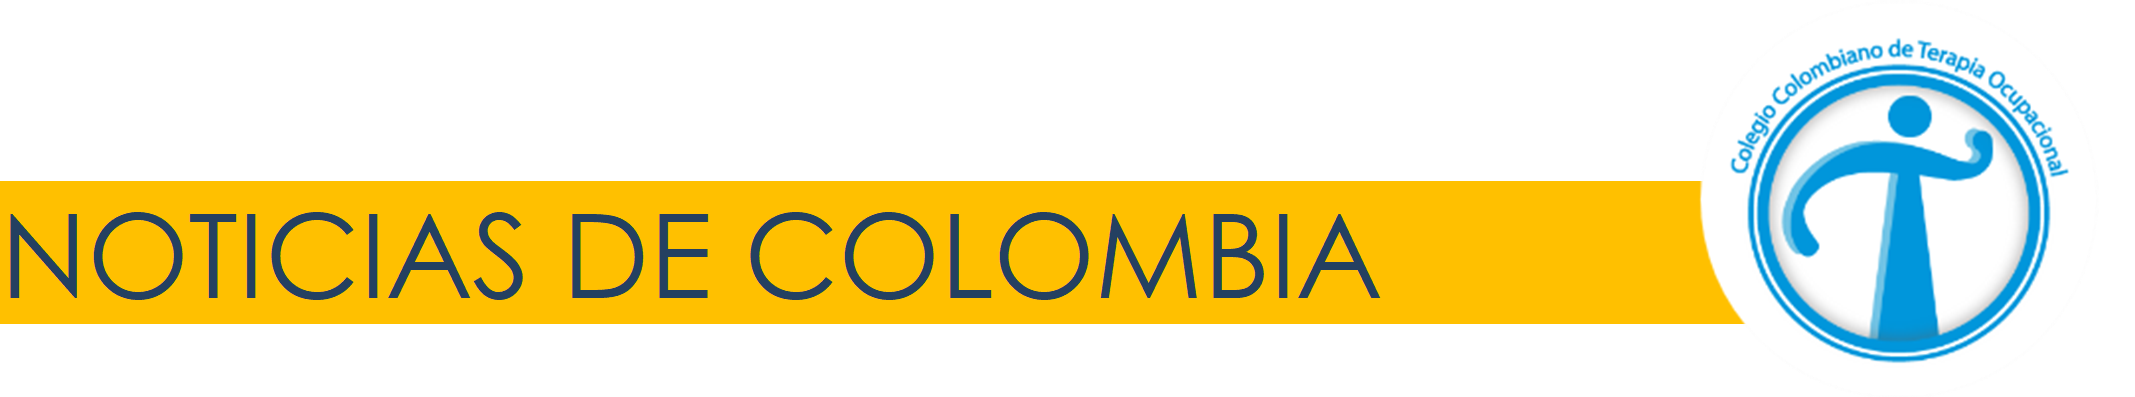 https://www.tocolombia.org/